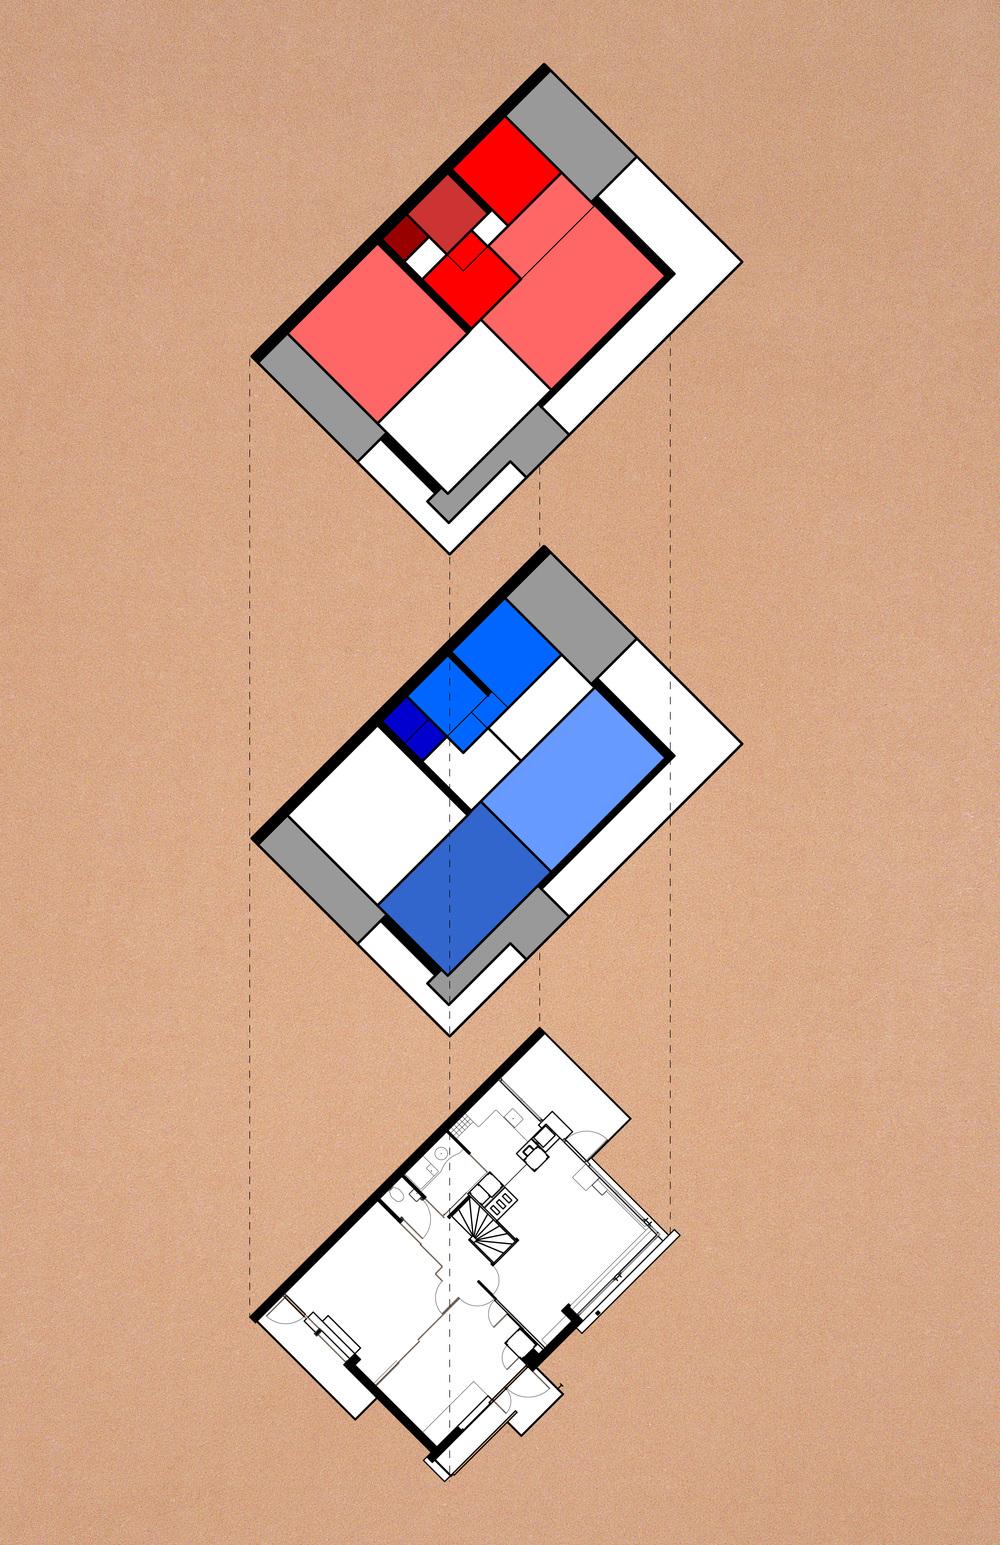 Rieveld-Schroder house planimetric diagram